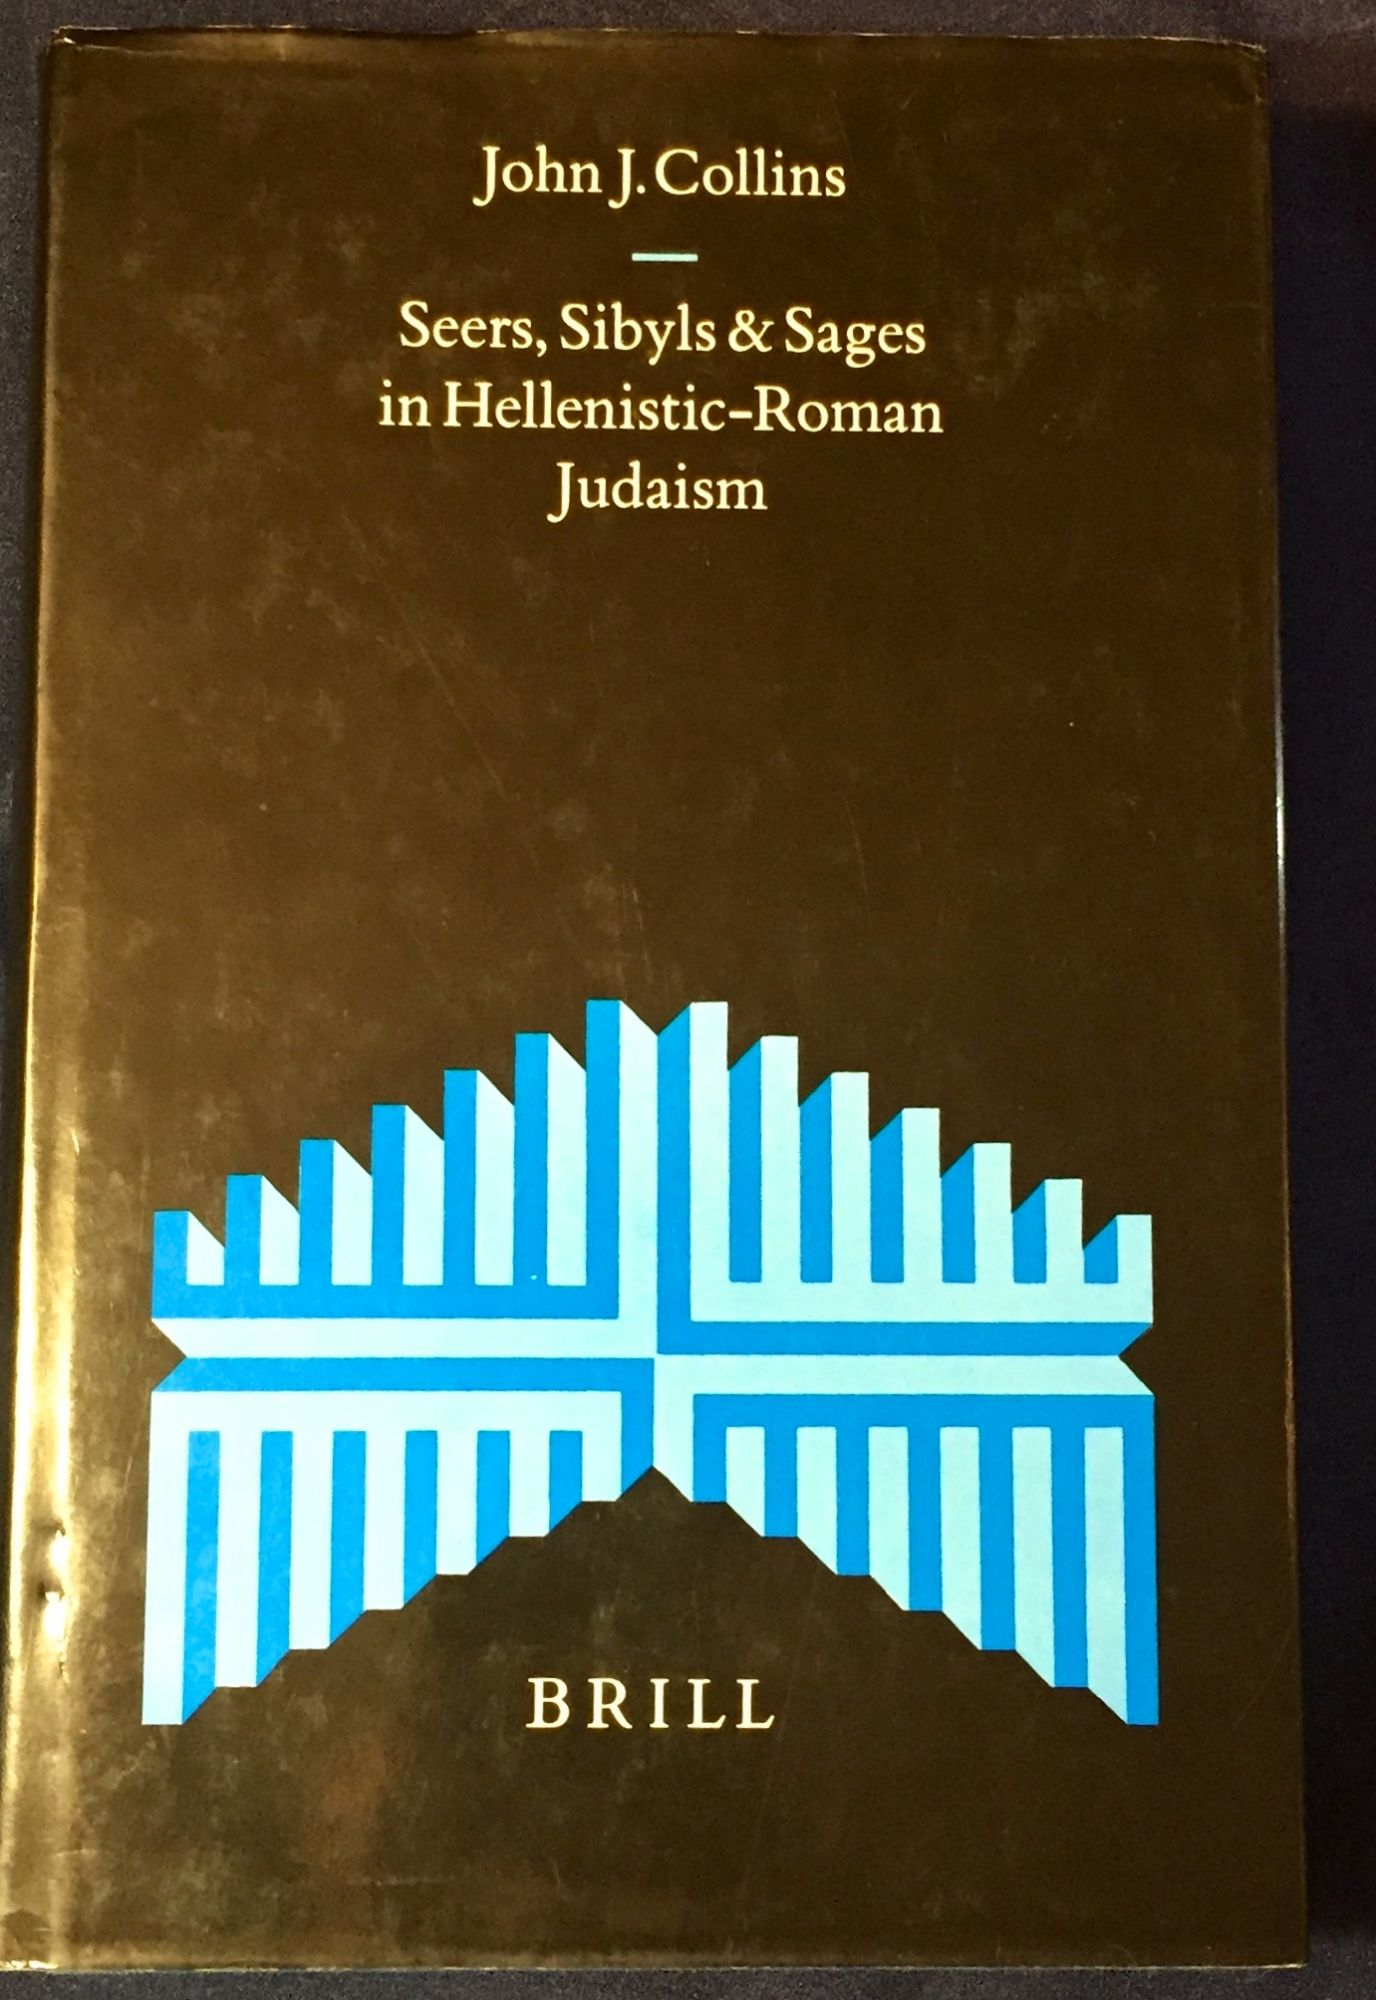 SEERS SIBYLS & SAGES IN HELLENISTIC-ROMAN JUDAISM - Collins, John J.